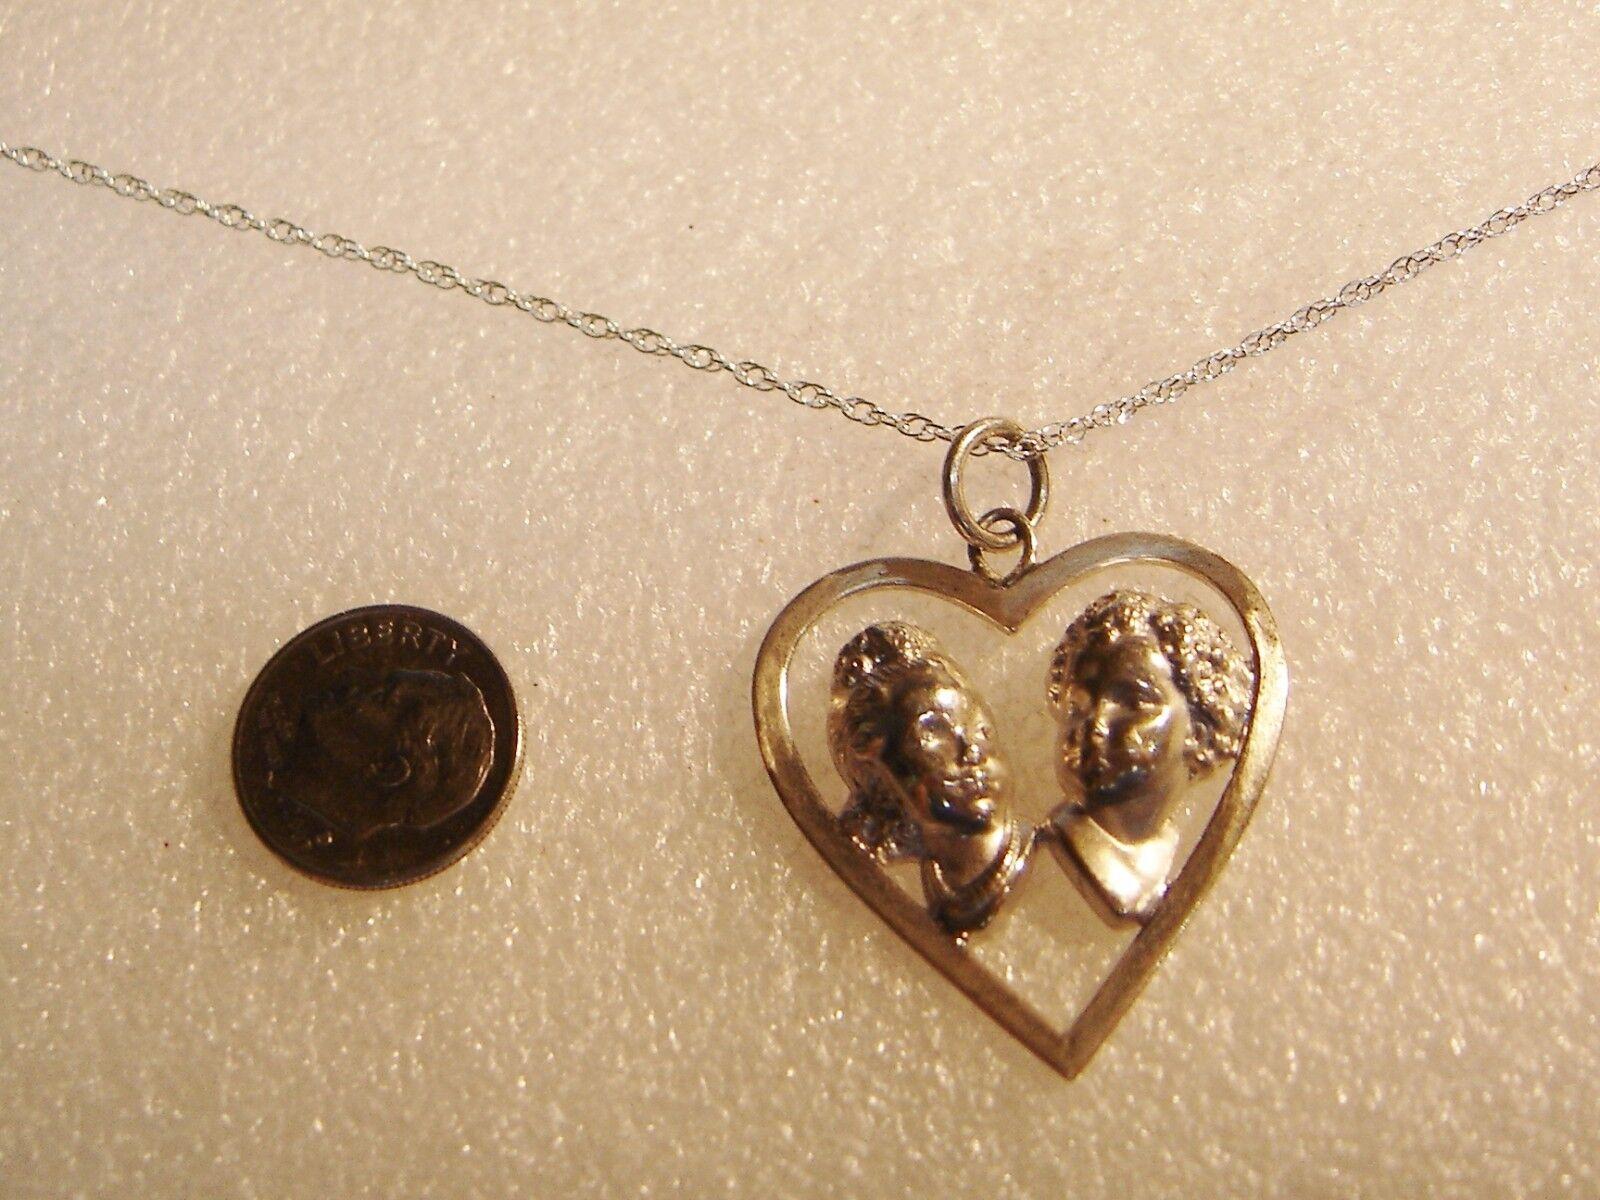 Wells argentoo Sterling Bambini Facce Ciondolo su 45 7 cm cm cm 2link Catenina N4-g 2de823